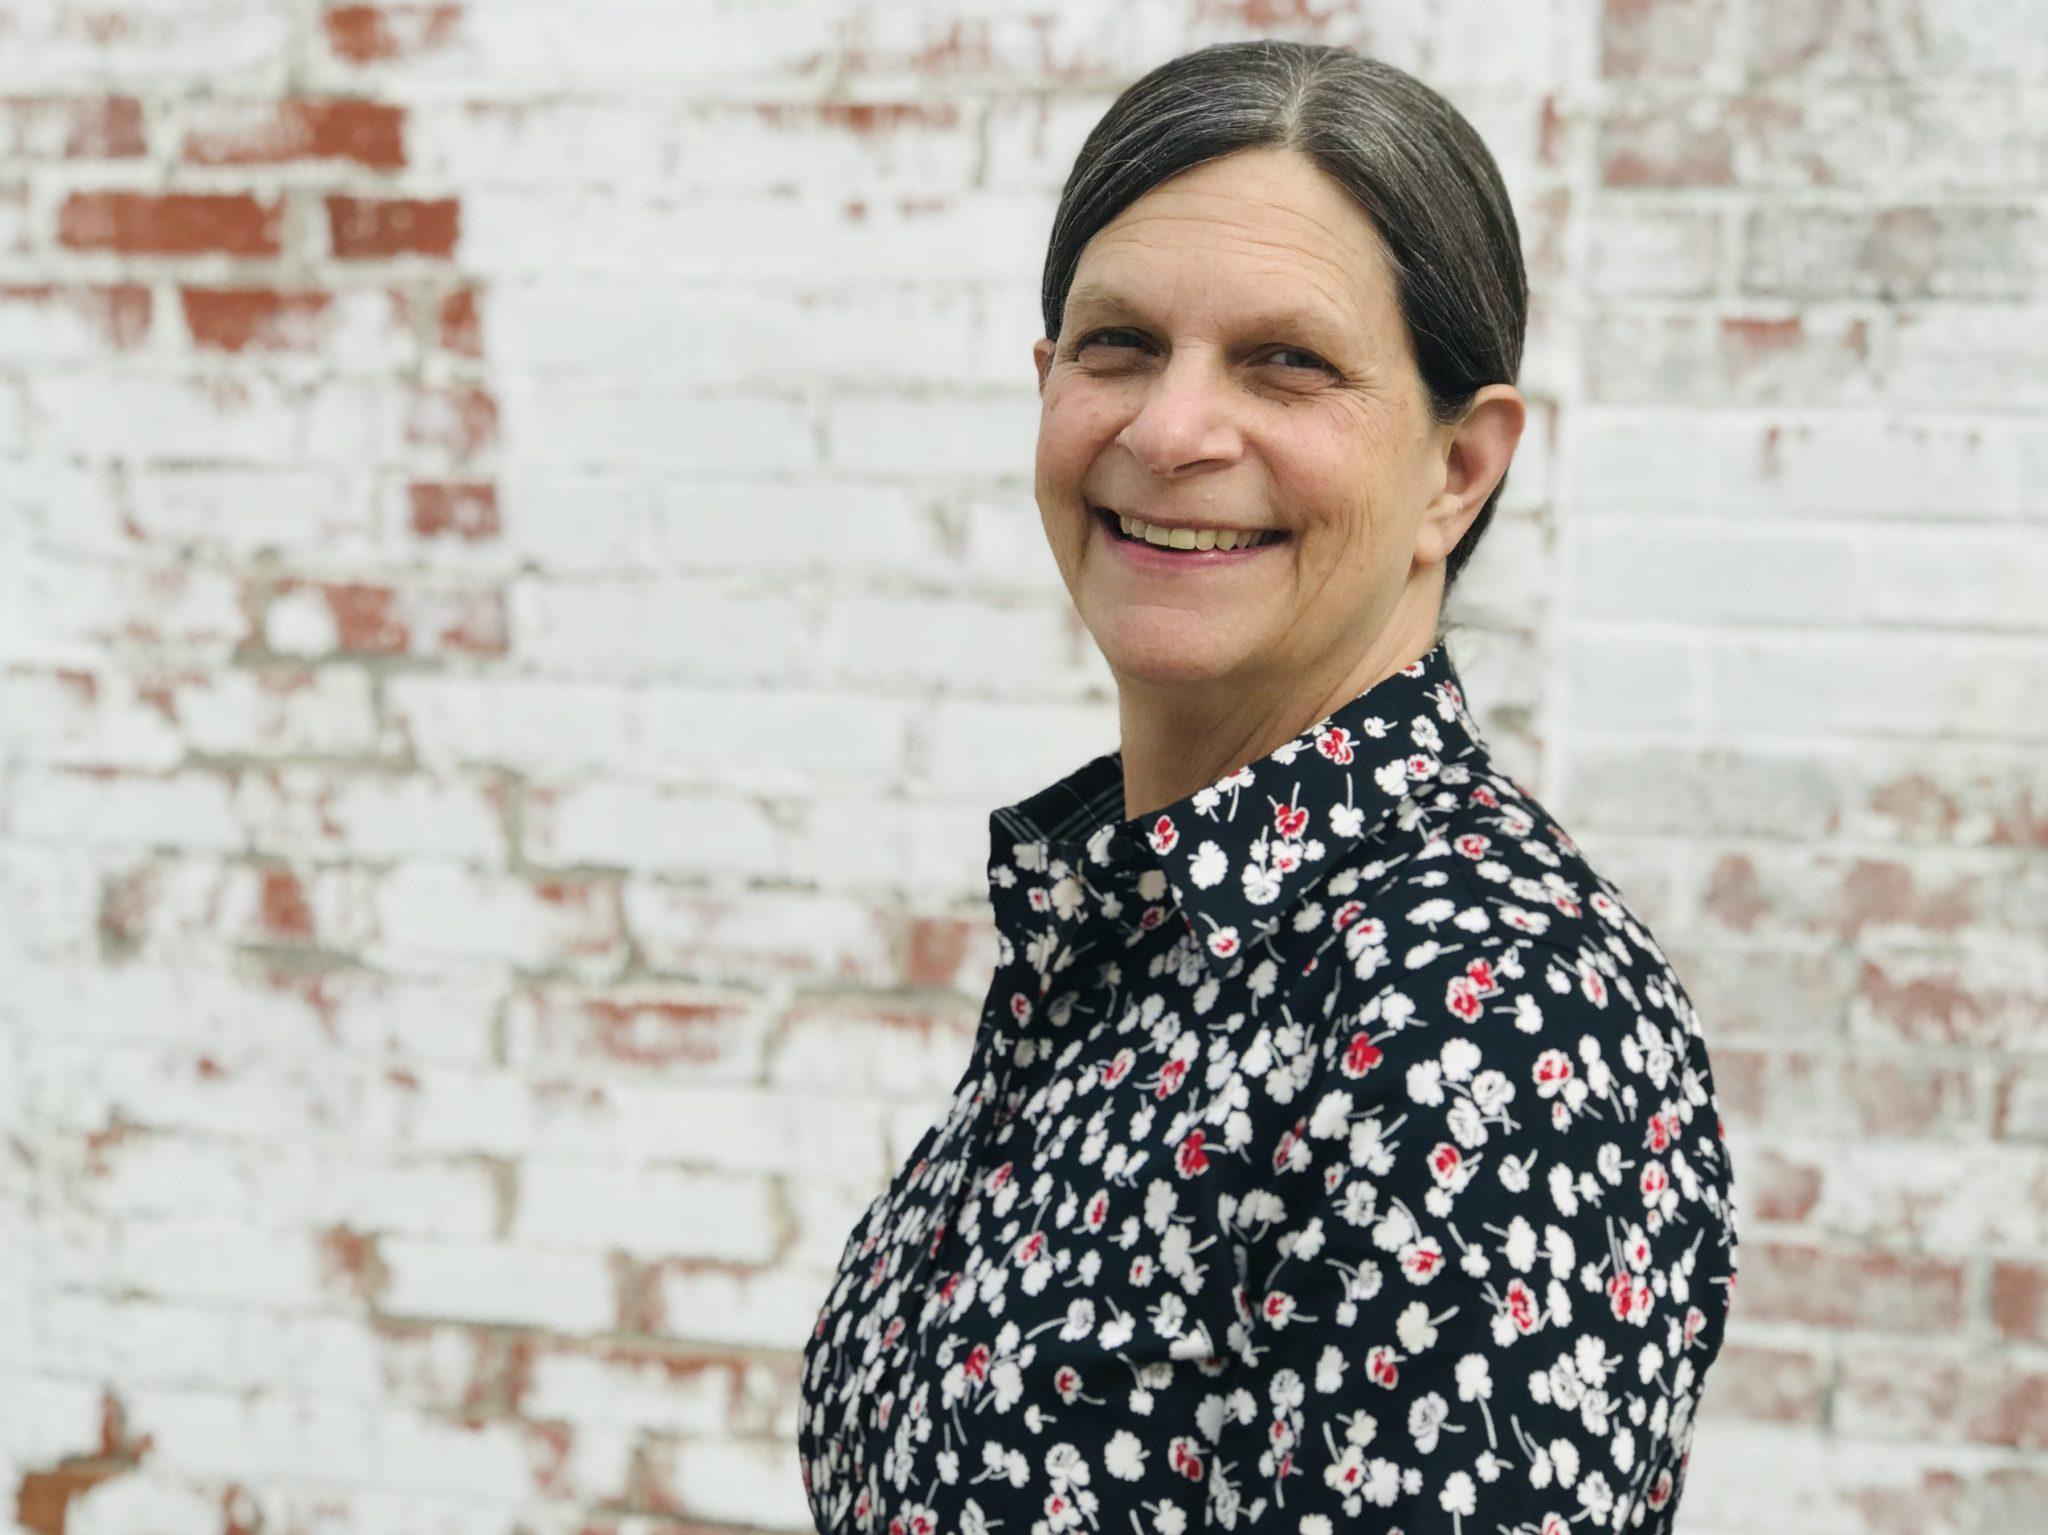 Kathleen Odom